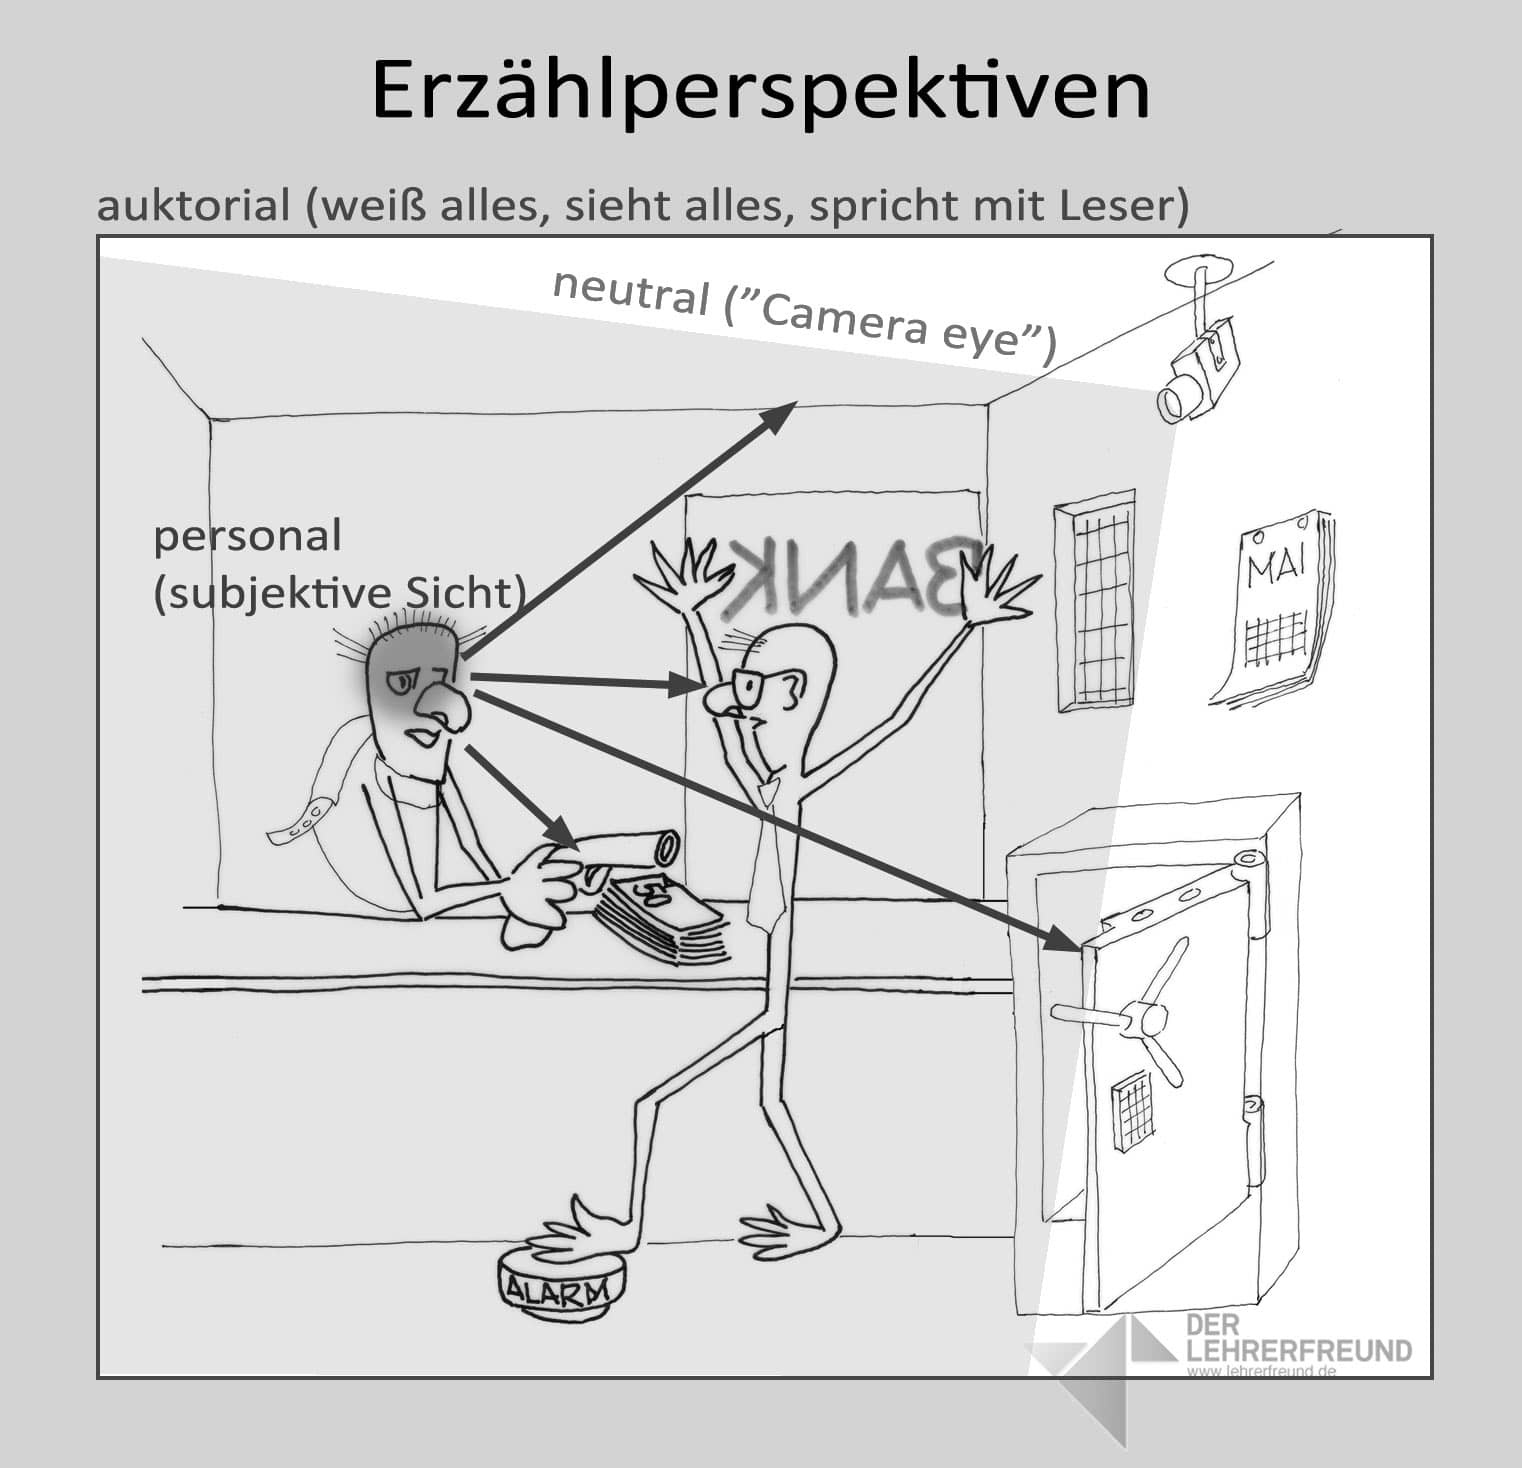 Erzählperspektiven: Tafelbild, Erläuterungen + Arbeitsblatt ...